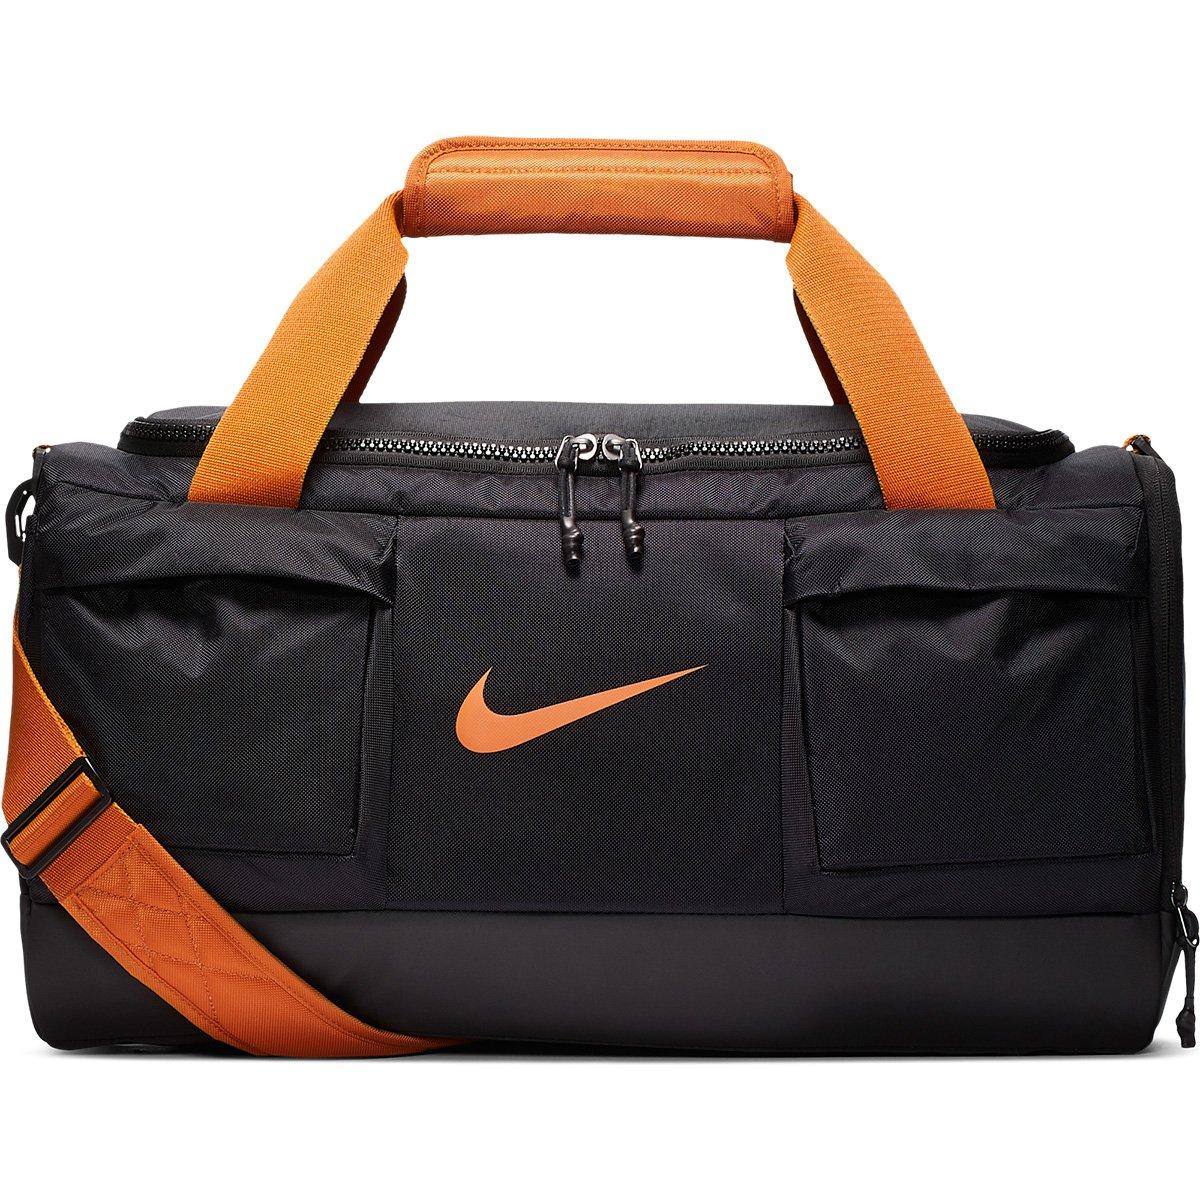 Indirecto Abultar Efectivamente  Bolsa Nike Vapor Power Pequeno Duff - Preto e Laranja | Netshoes